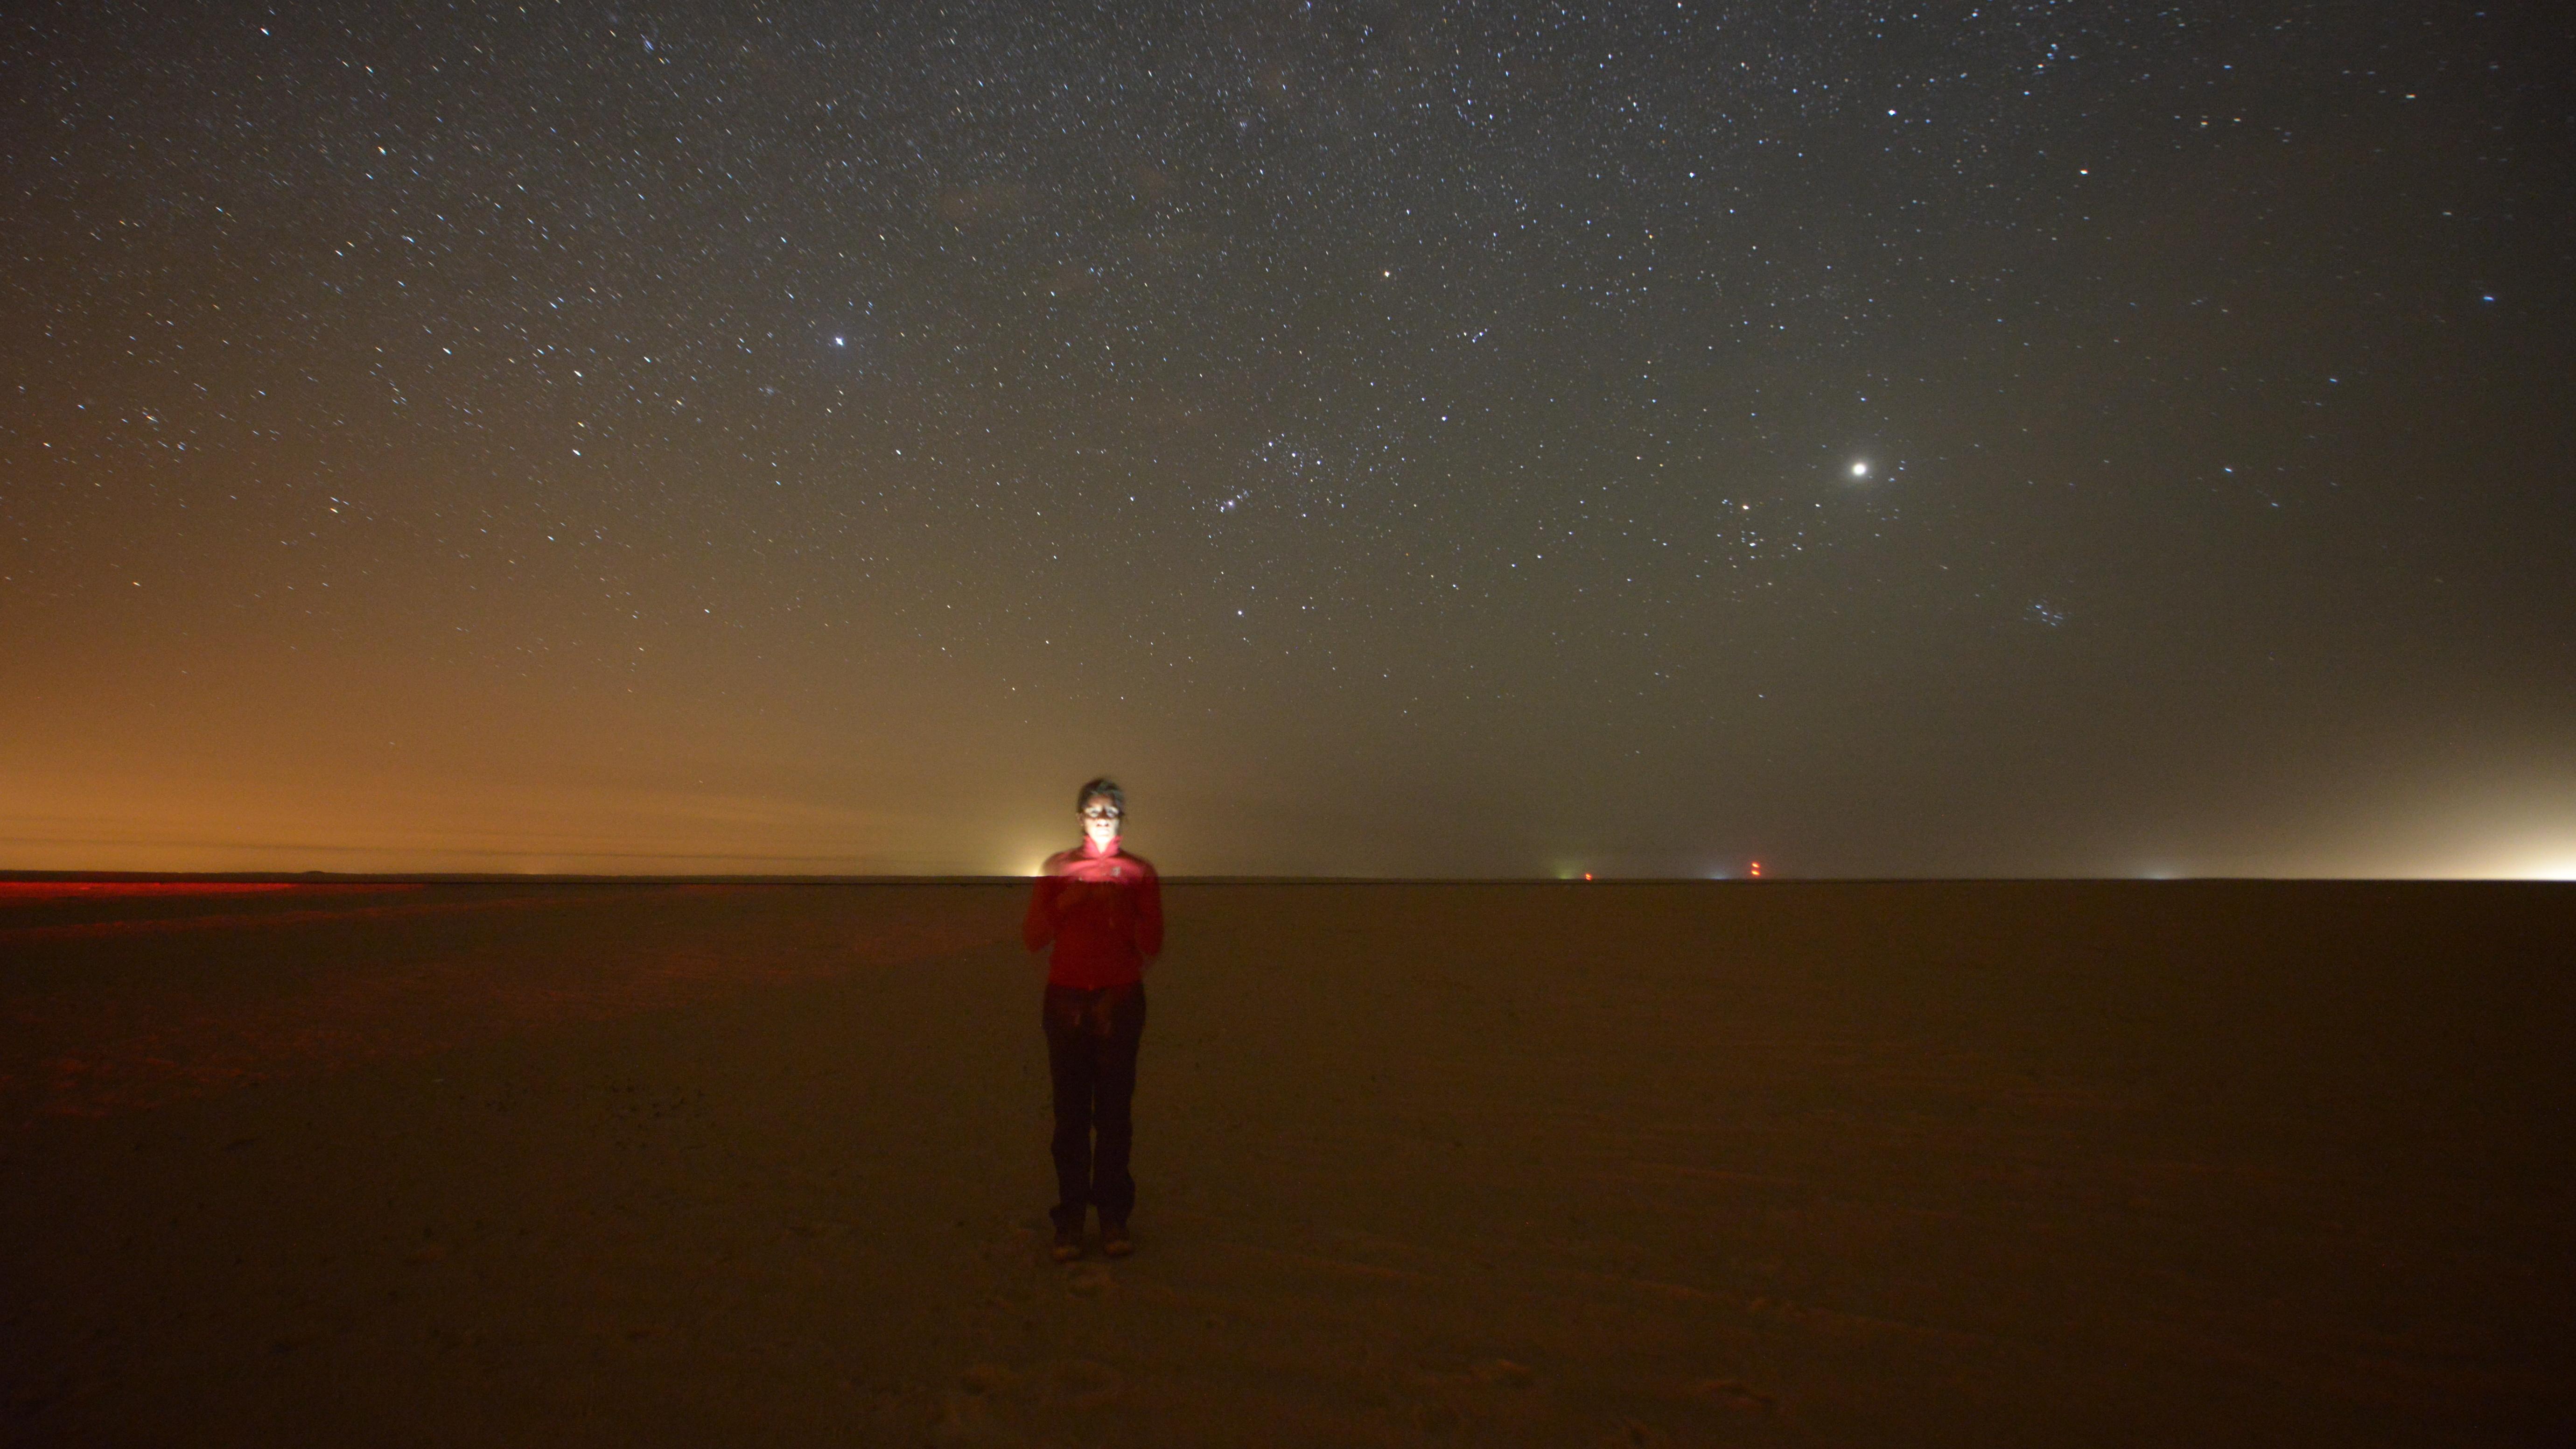 Star-gazing-Kuwait-Desert-Salmi-trail-March-2013 – THE ...